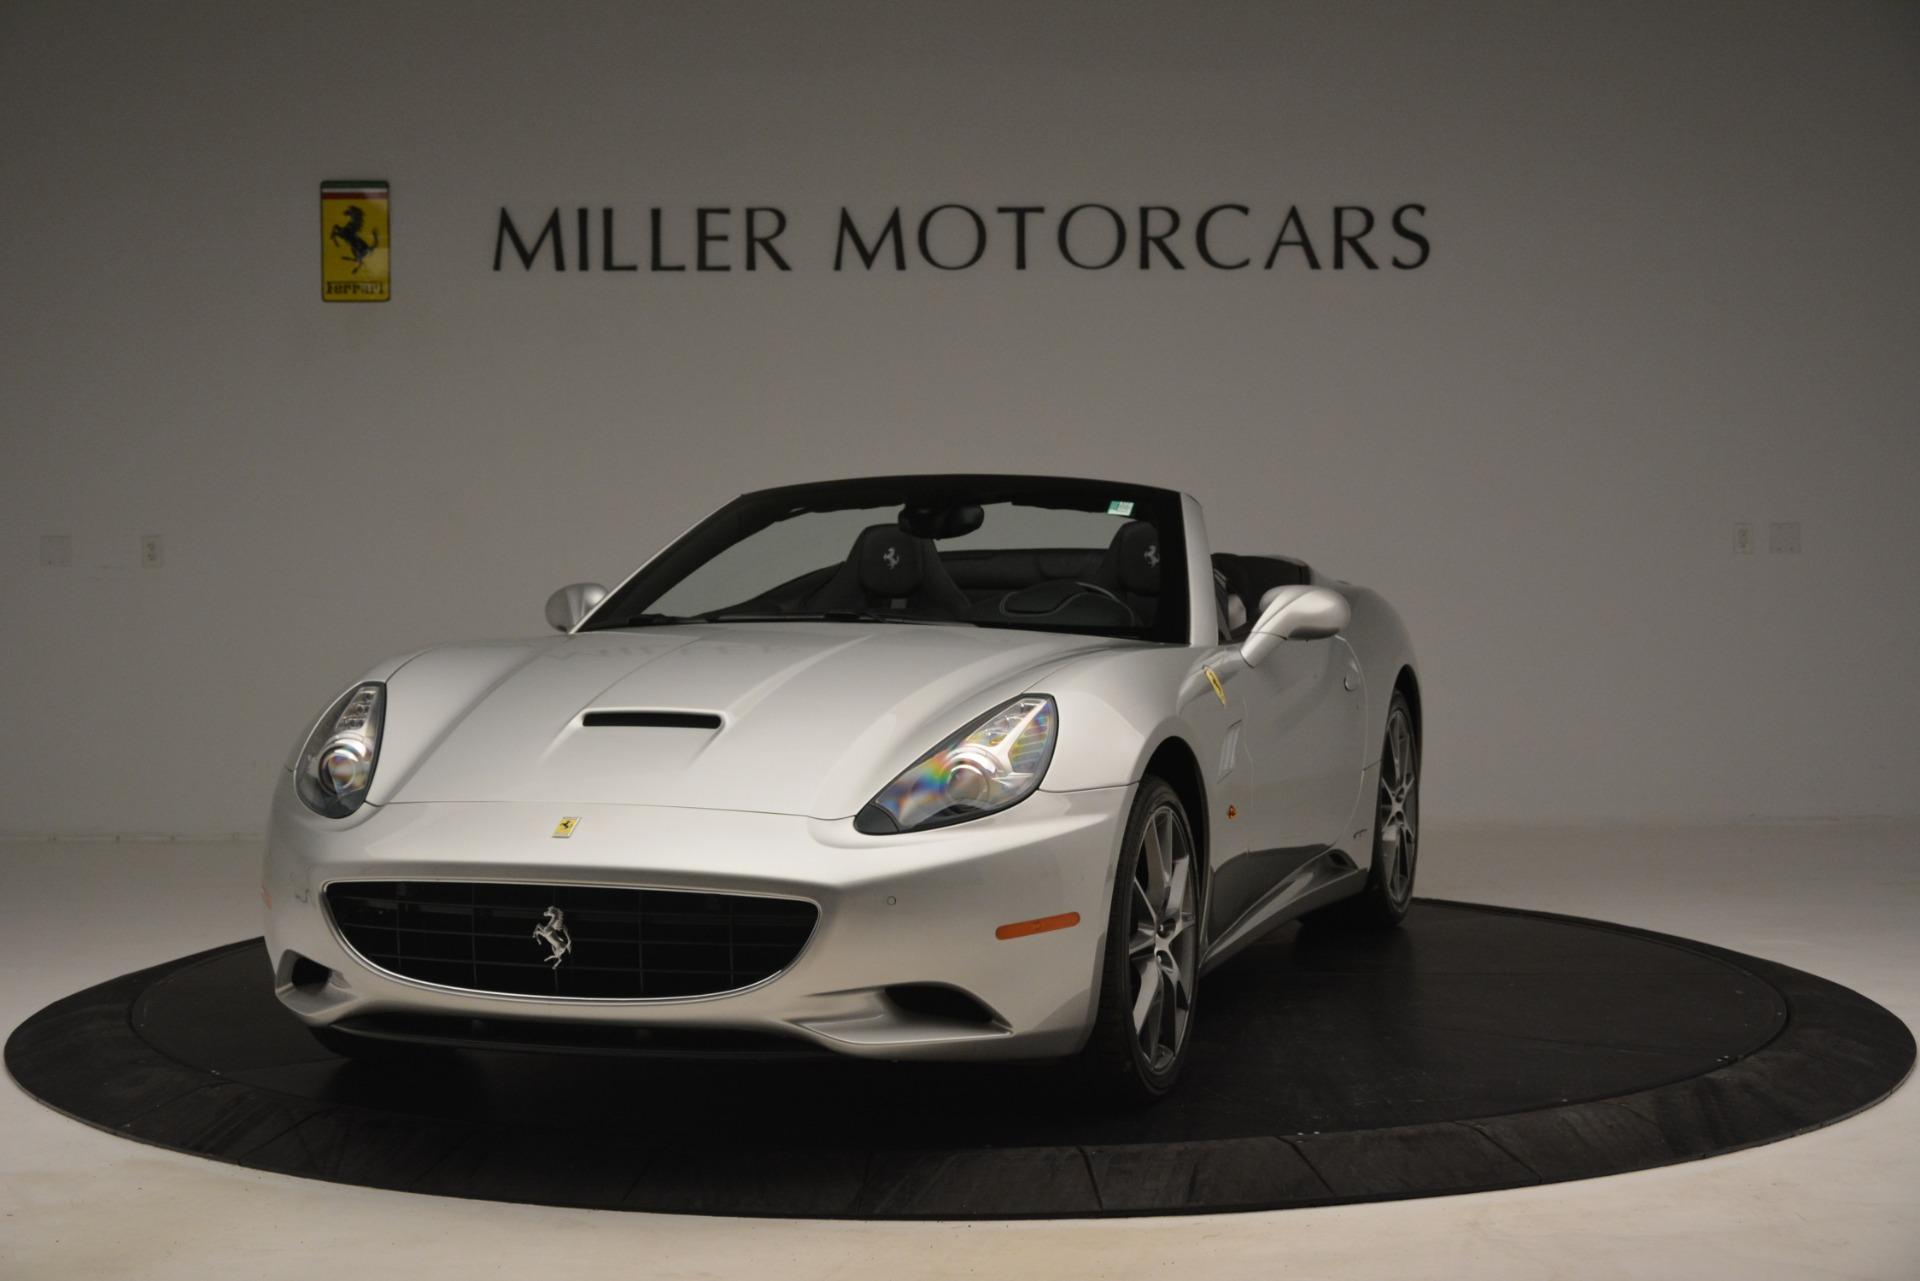 Used 2012 Ferrari California for sale Sold at McLaren Greenwich in Greenwich CT 06830 1